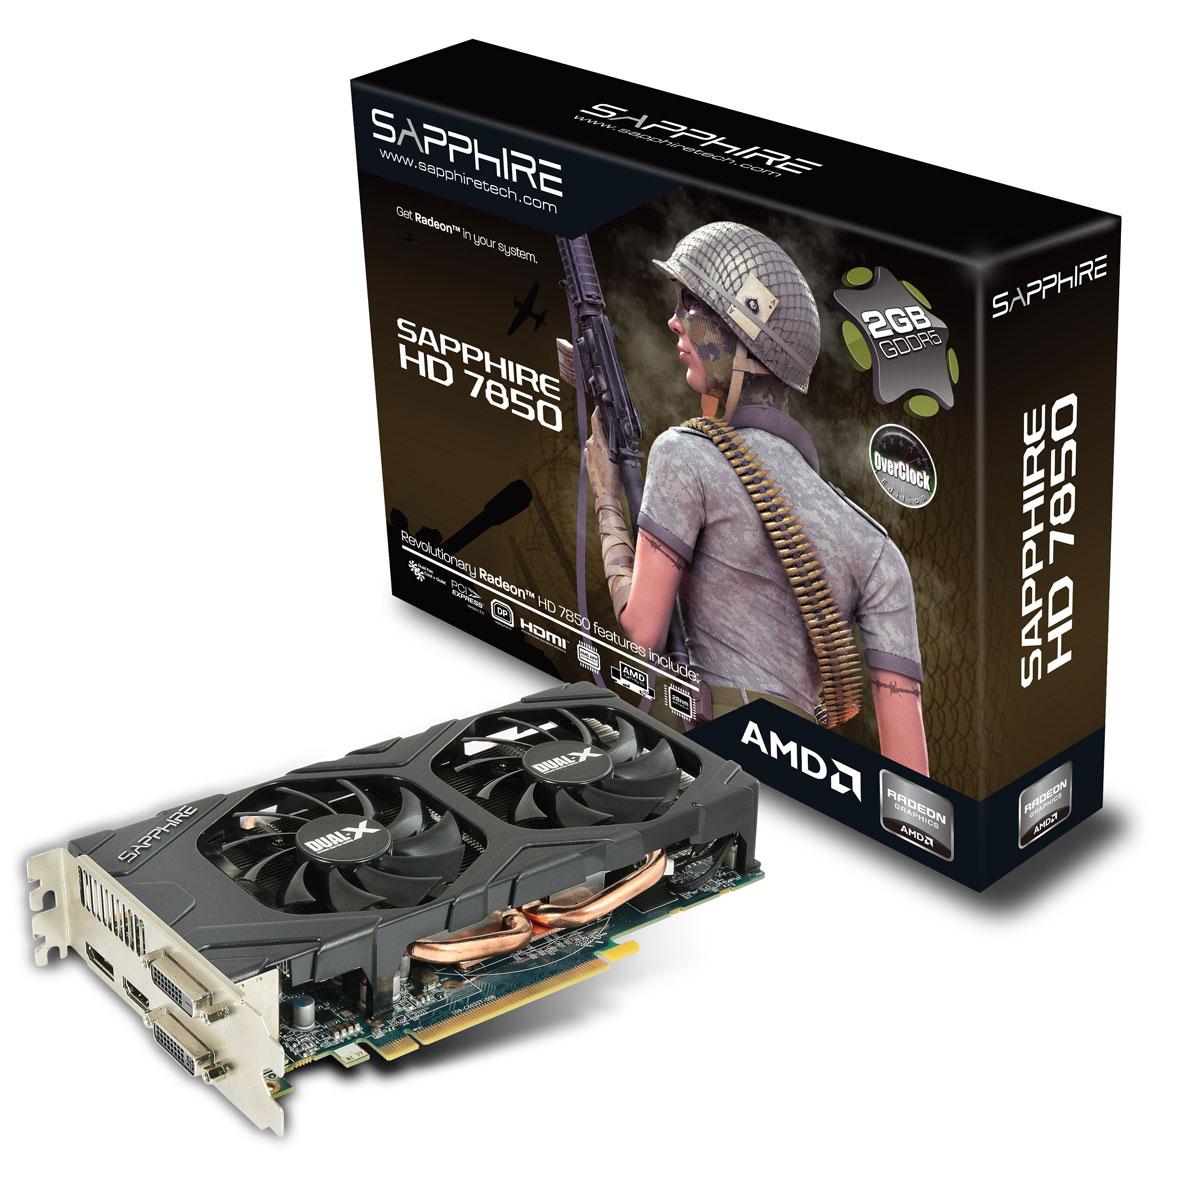 Sapphire Radeon HD 7850 OC Edition 2 Go - Carte graphique SAPPHIRE sur LDLC.com